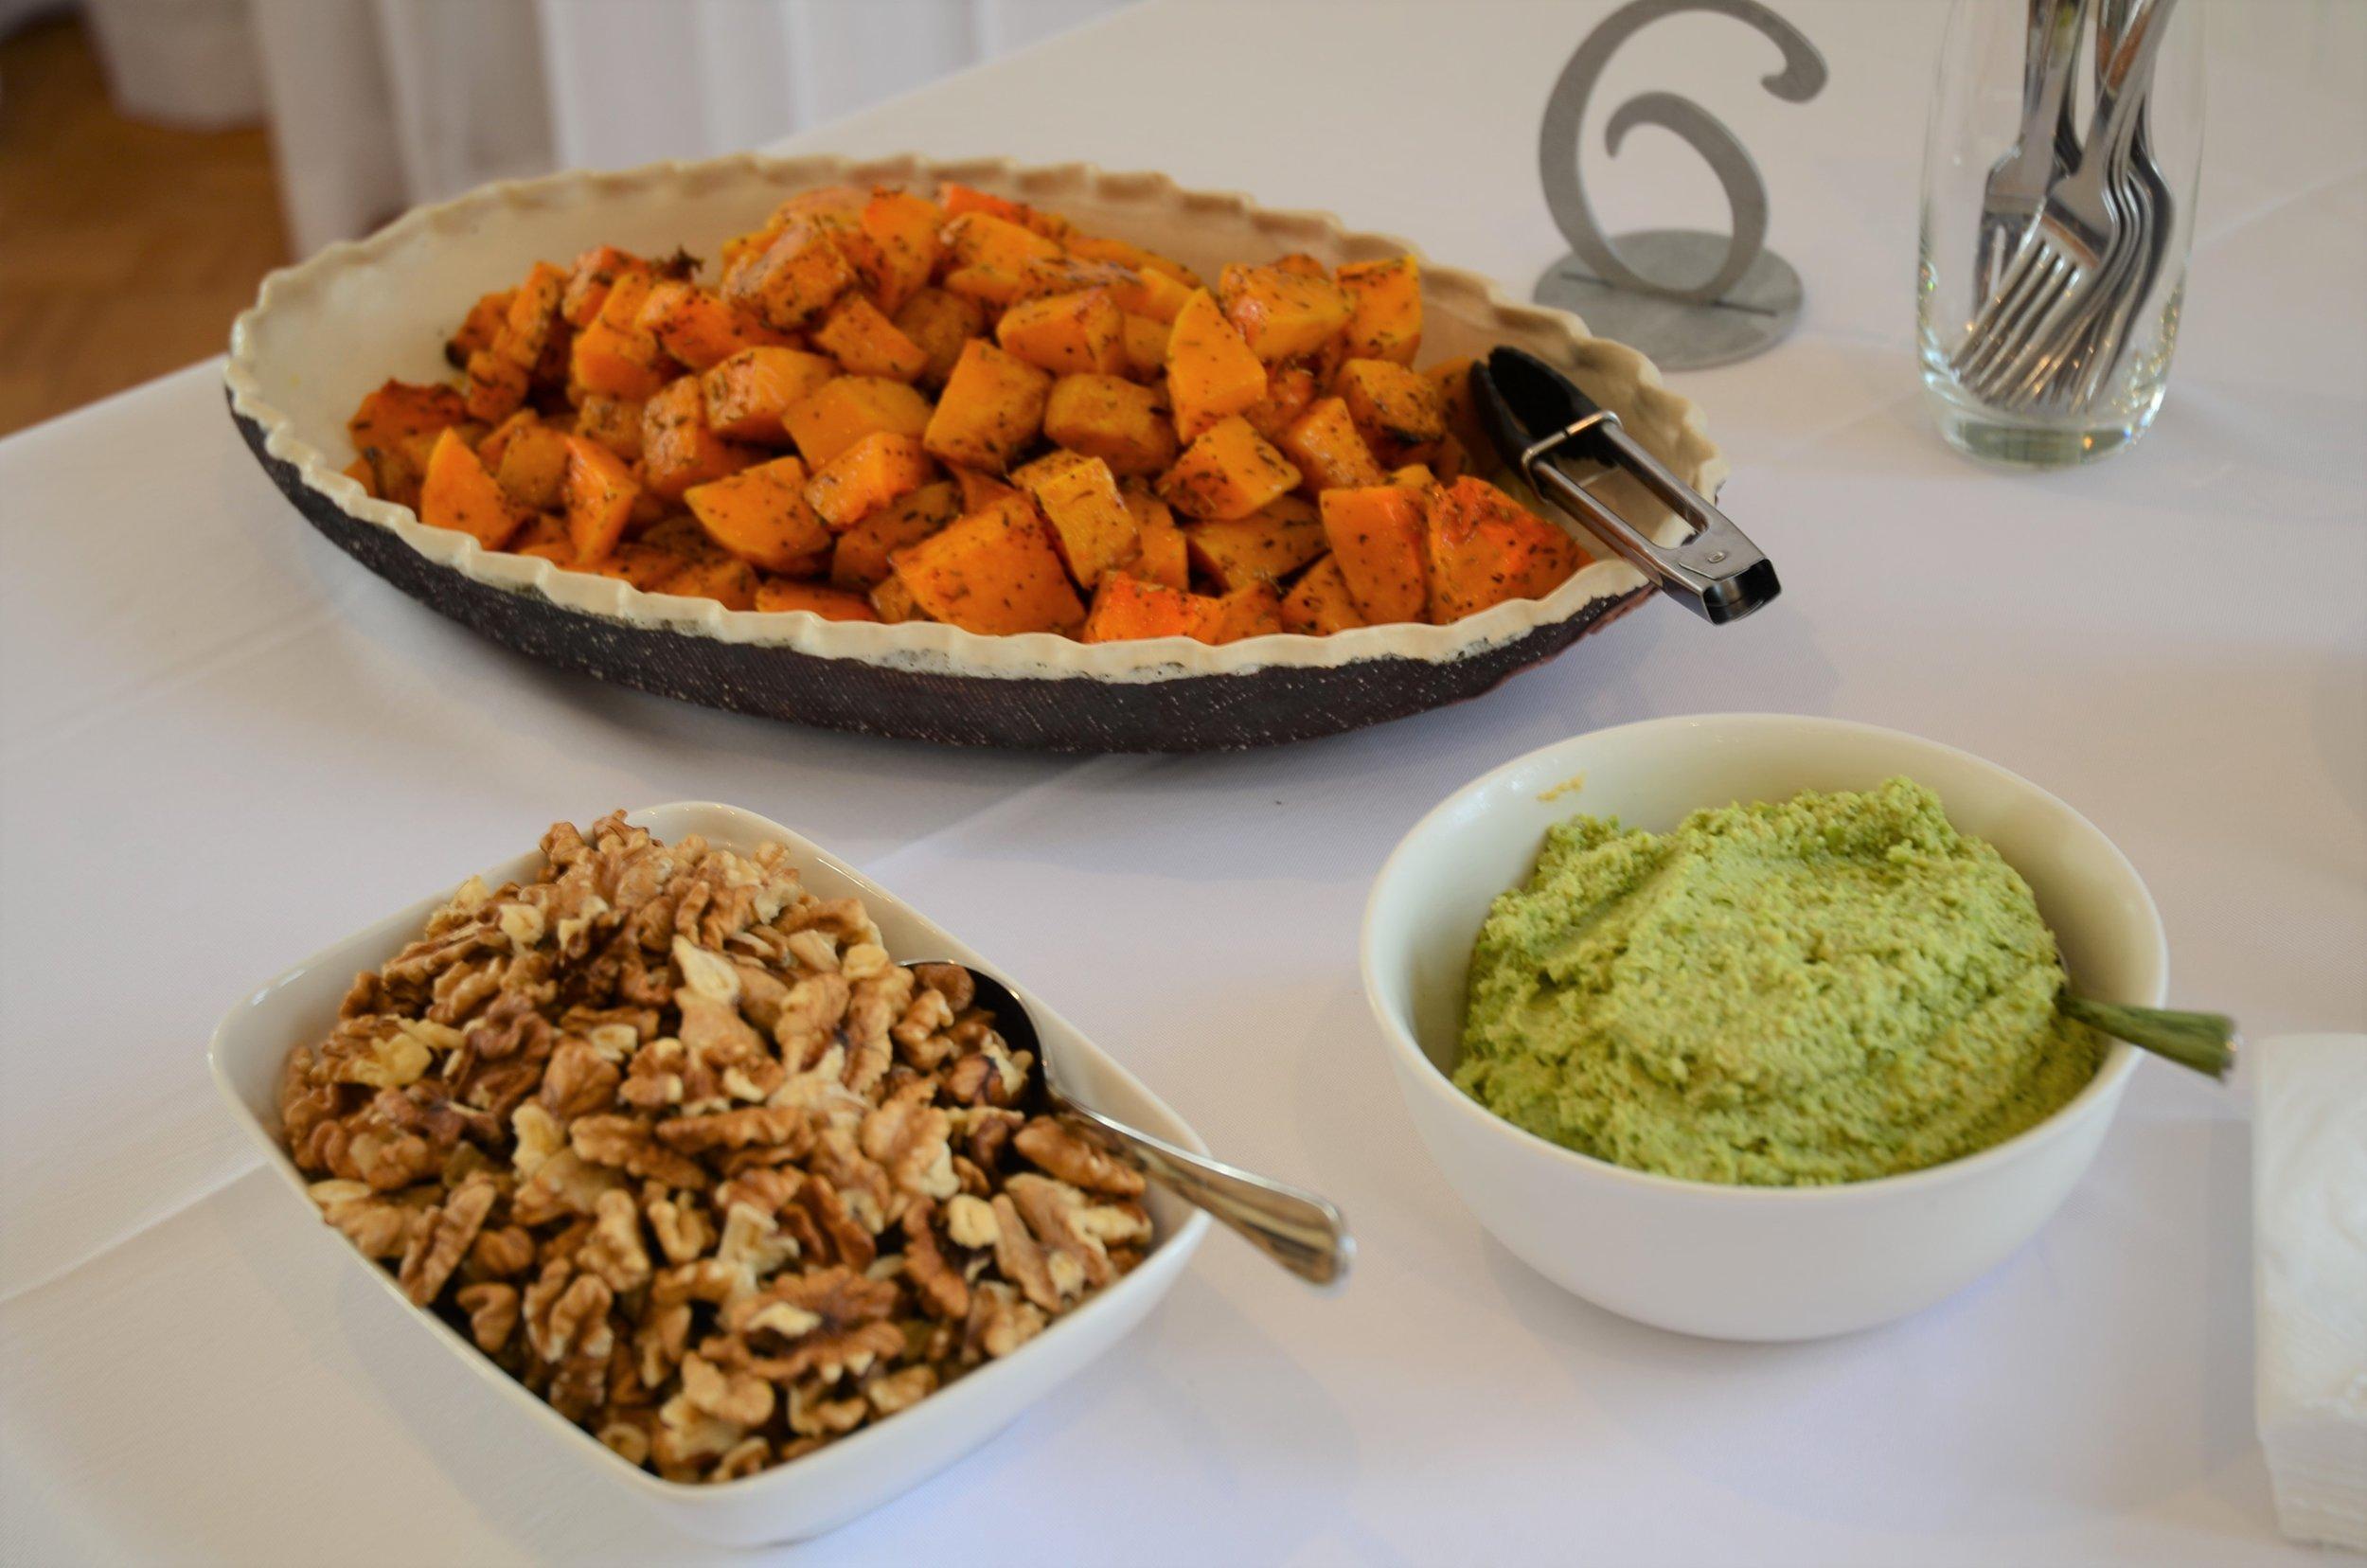 Spiced Sweet Potatoes Walnuts and Pesto